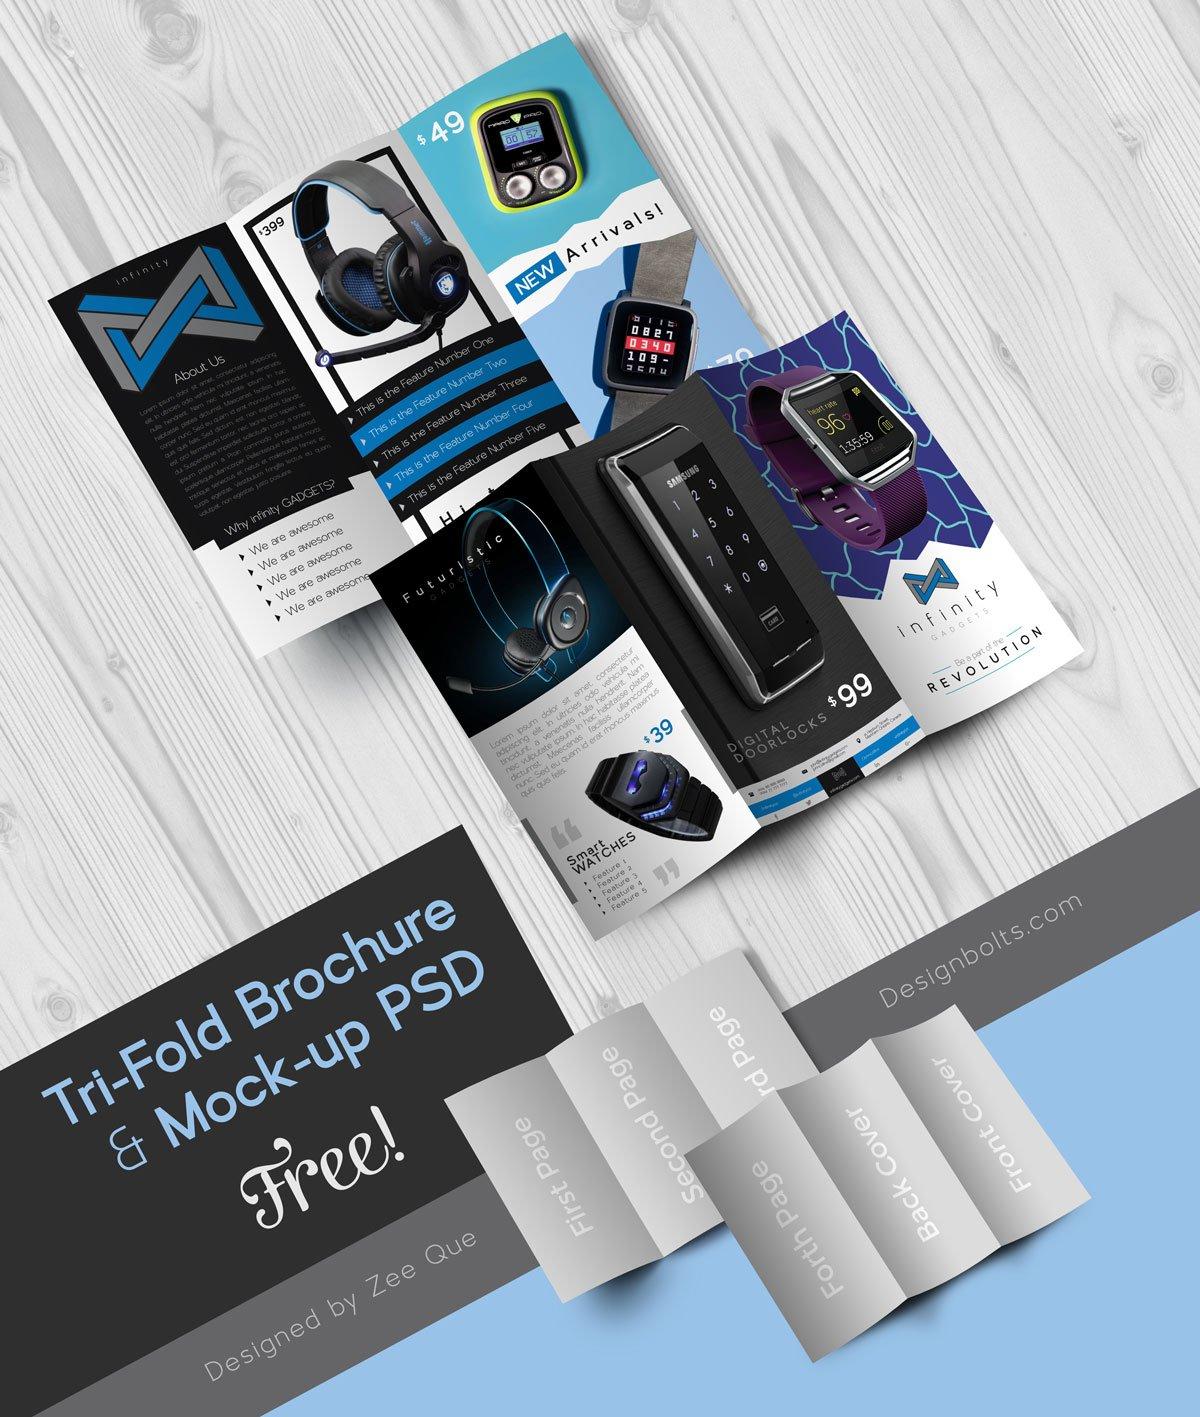 Free-Tech-Gadgets-Tri-Fold-Brochure-Design-Template-&-Mock-up-PSD